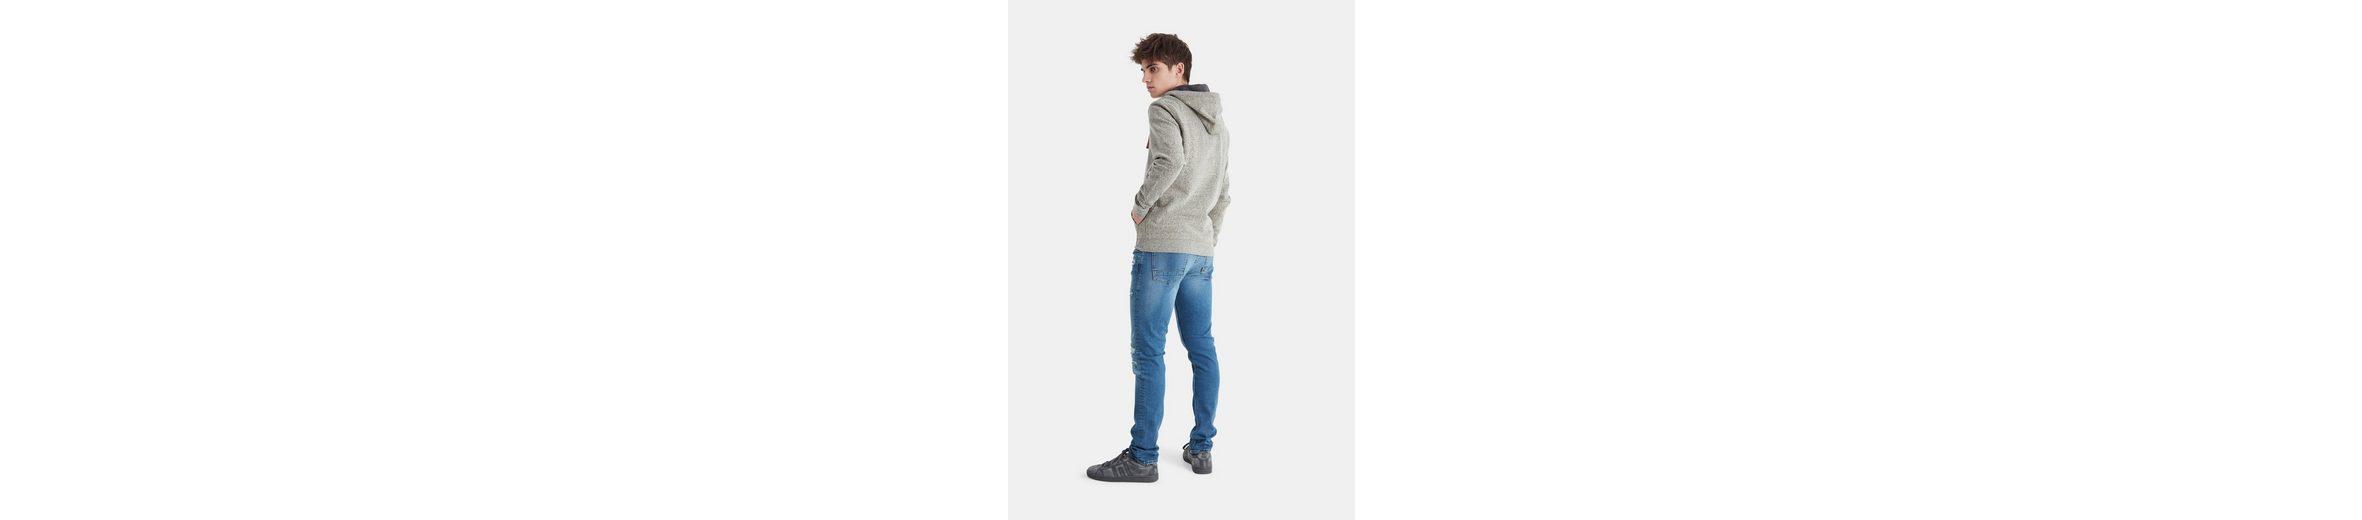 Blend Stretch-Jeans Rabatt Komfortabel AmkLvh3AxI